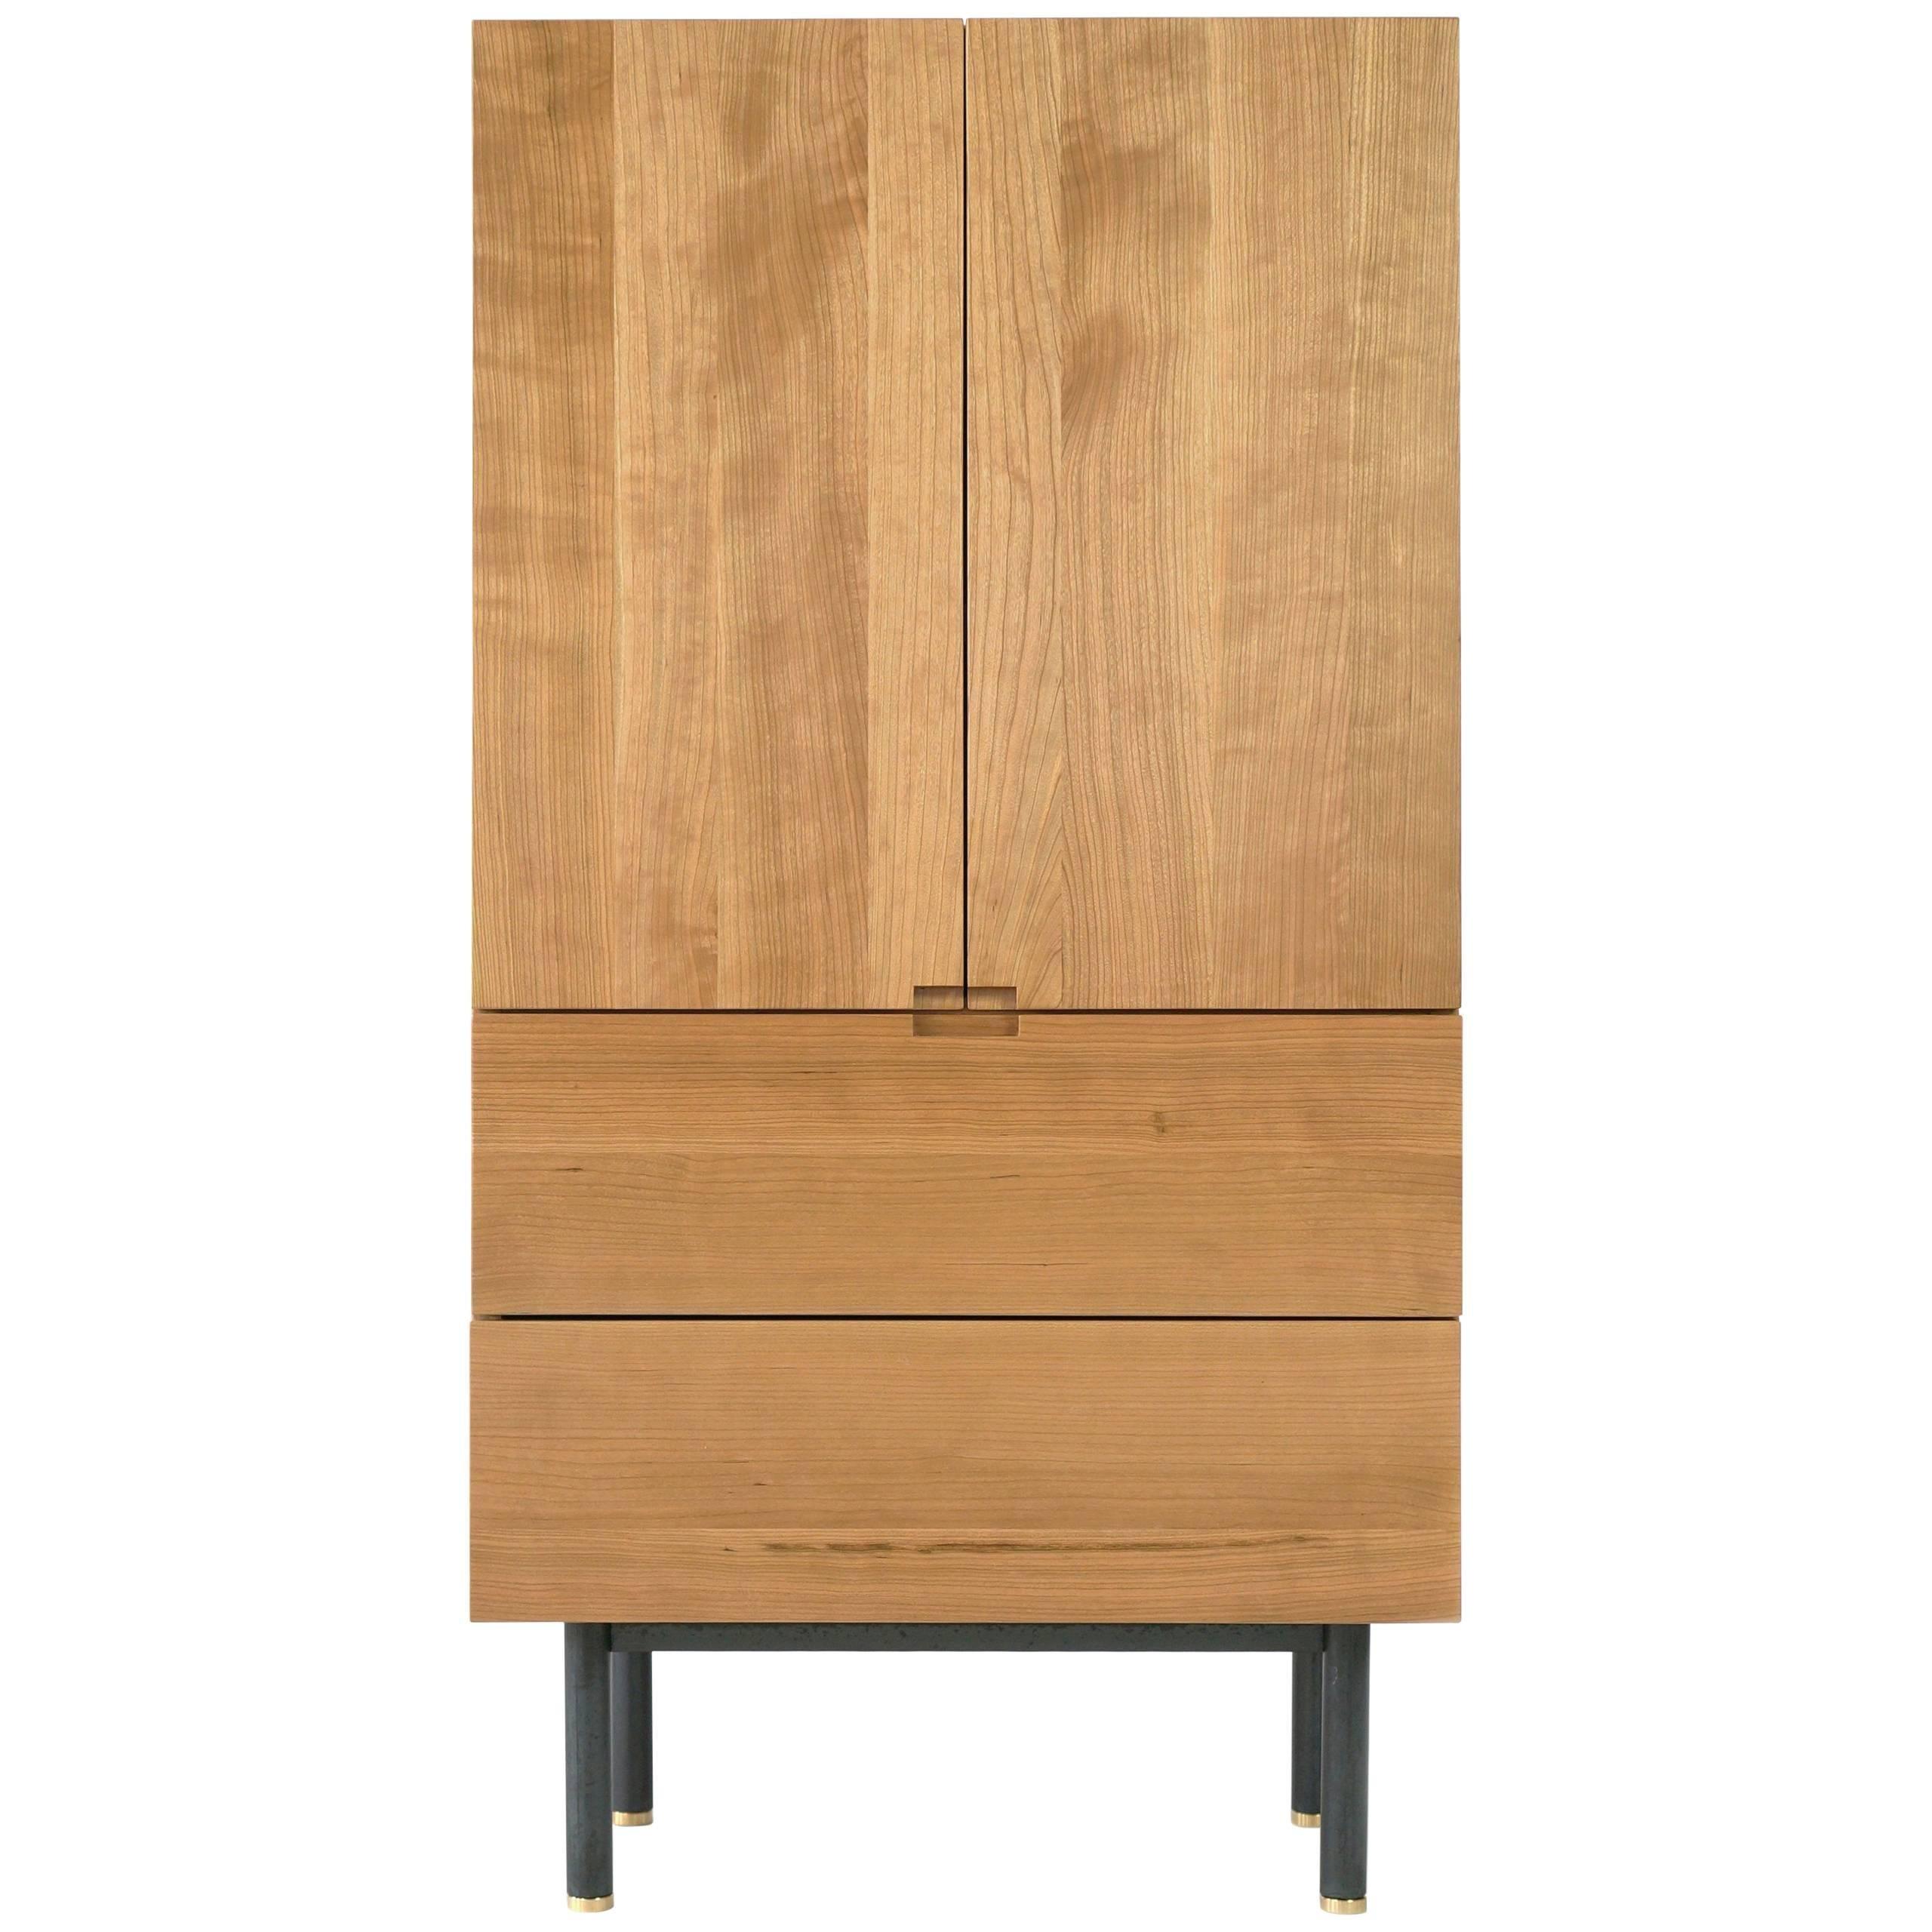 Beau Ratio Contemporary Cherry Bar Cabinet For Sale